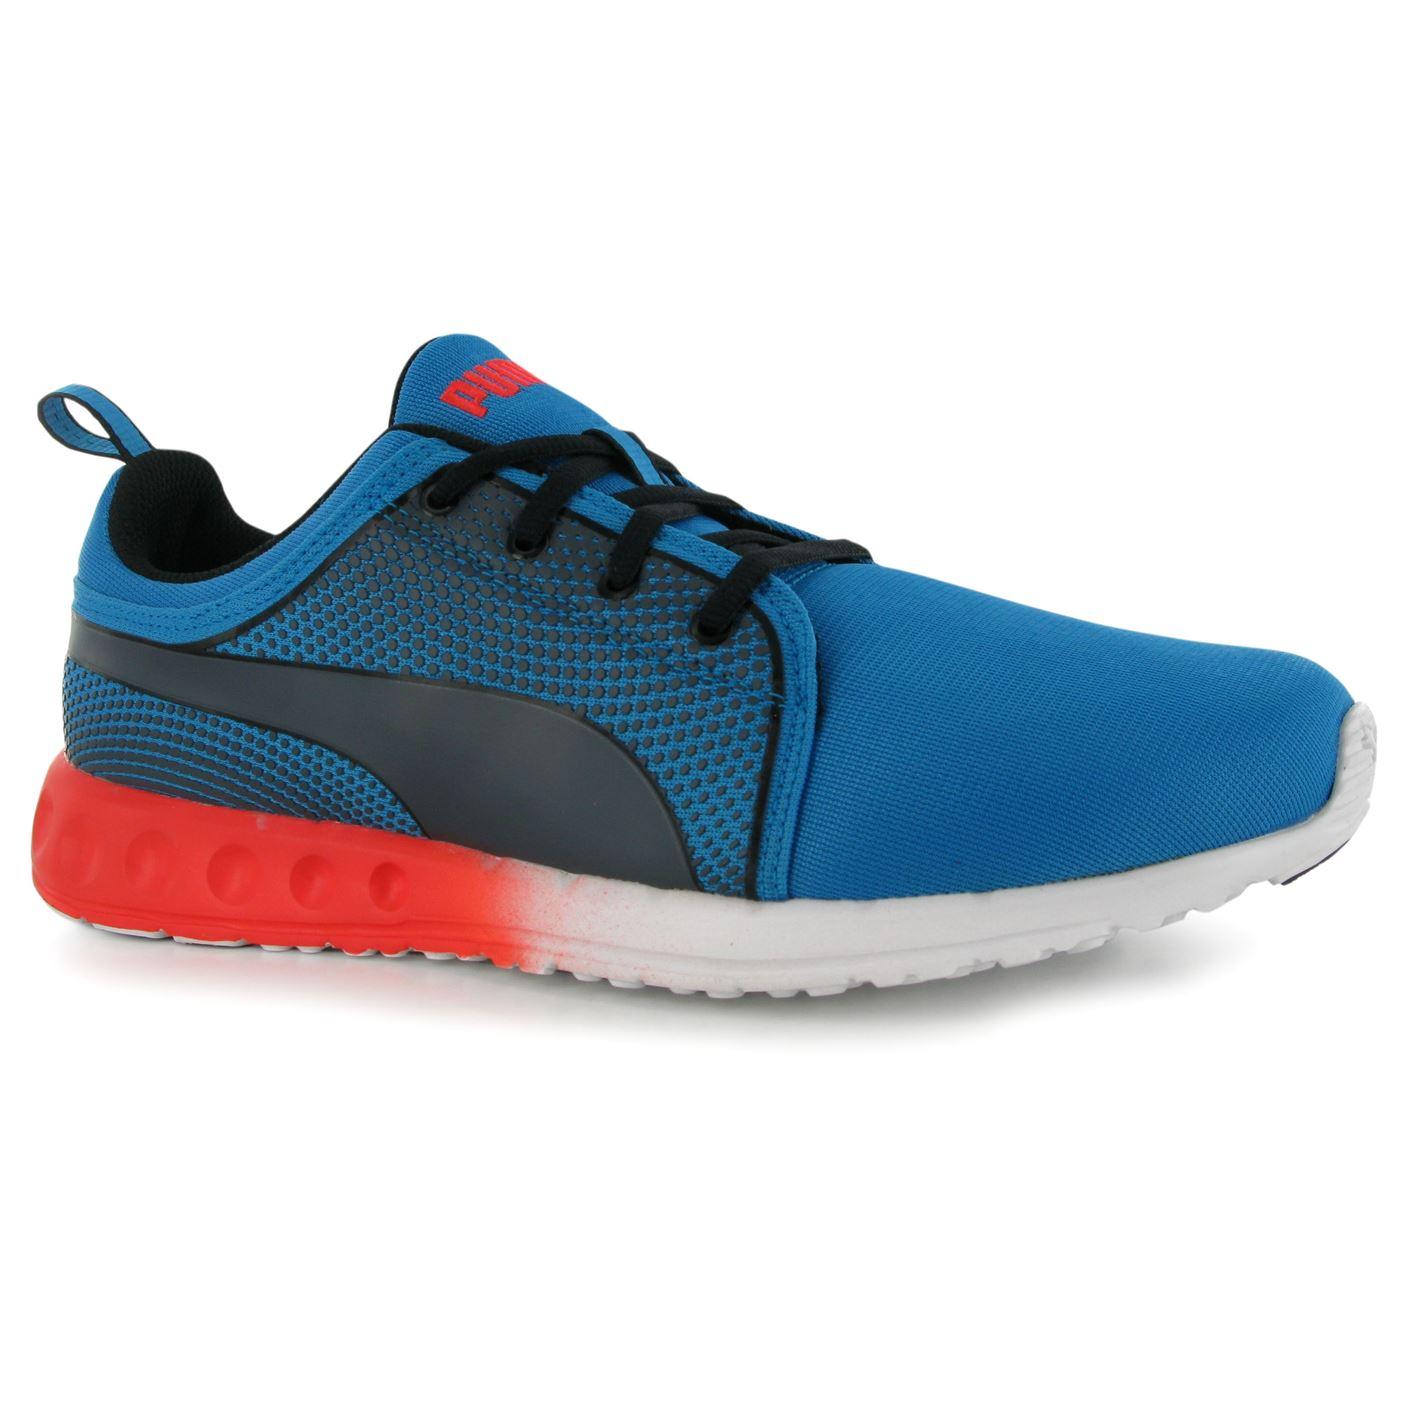 Adidasi sport Puma Carson 3D pentru Barbati albastru negru